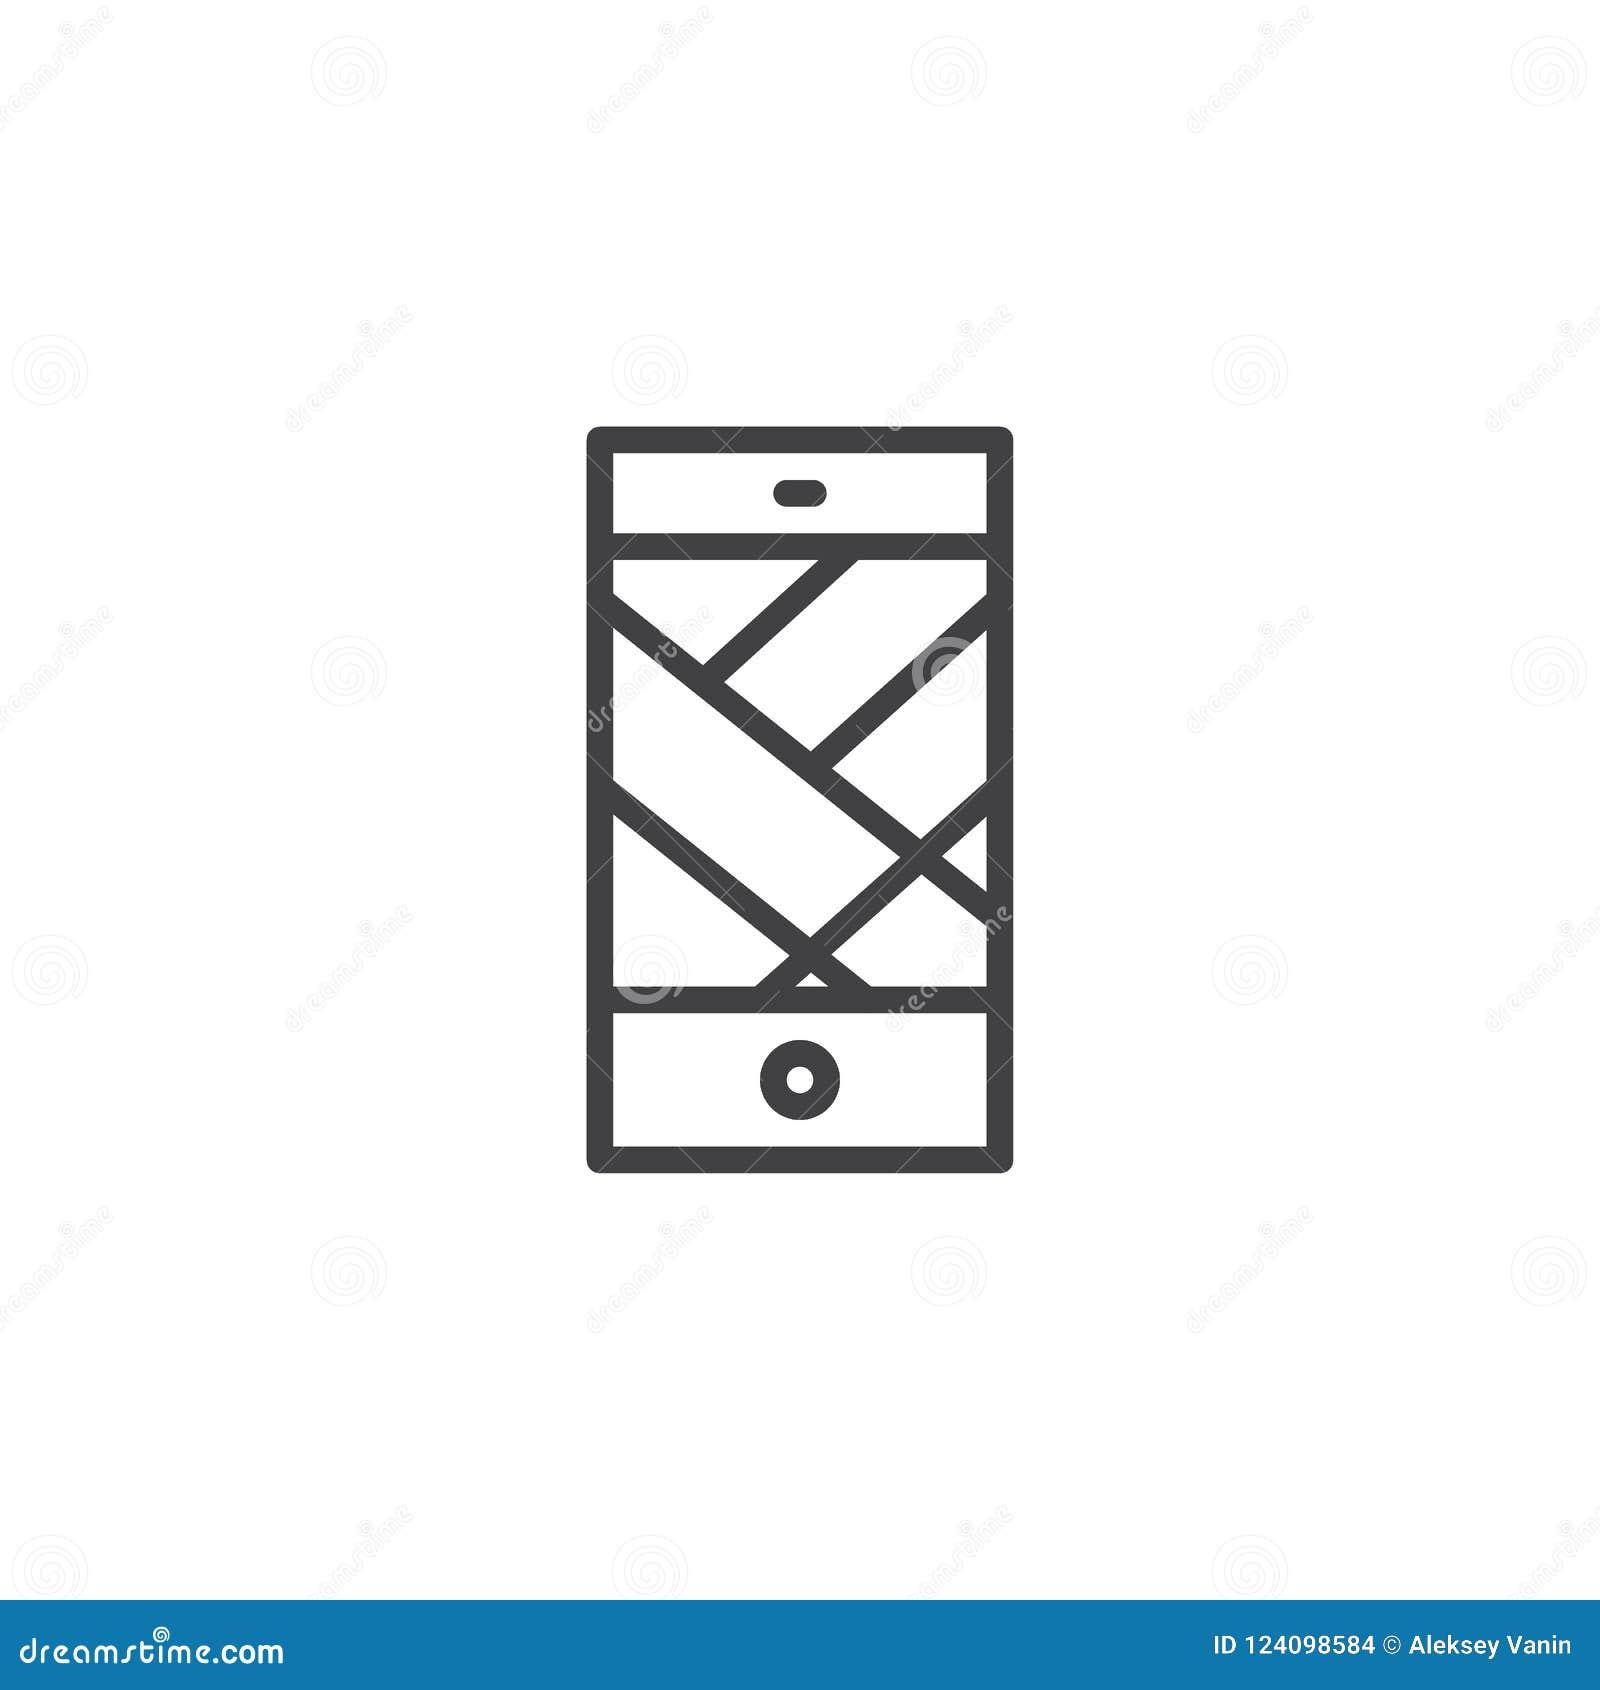 Mobile Navigation App Outline Icon Stock Vector - Illustration of